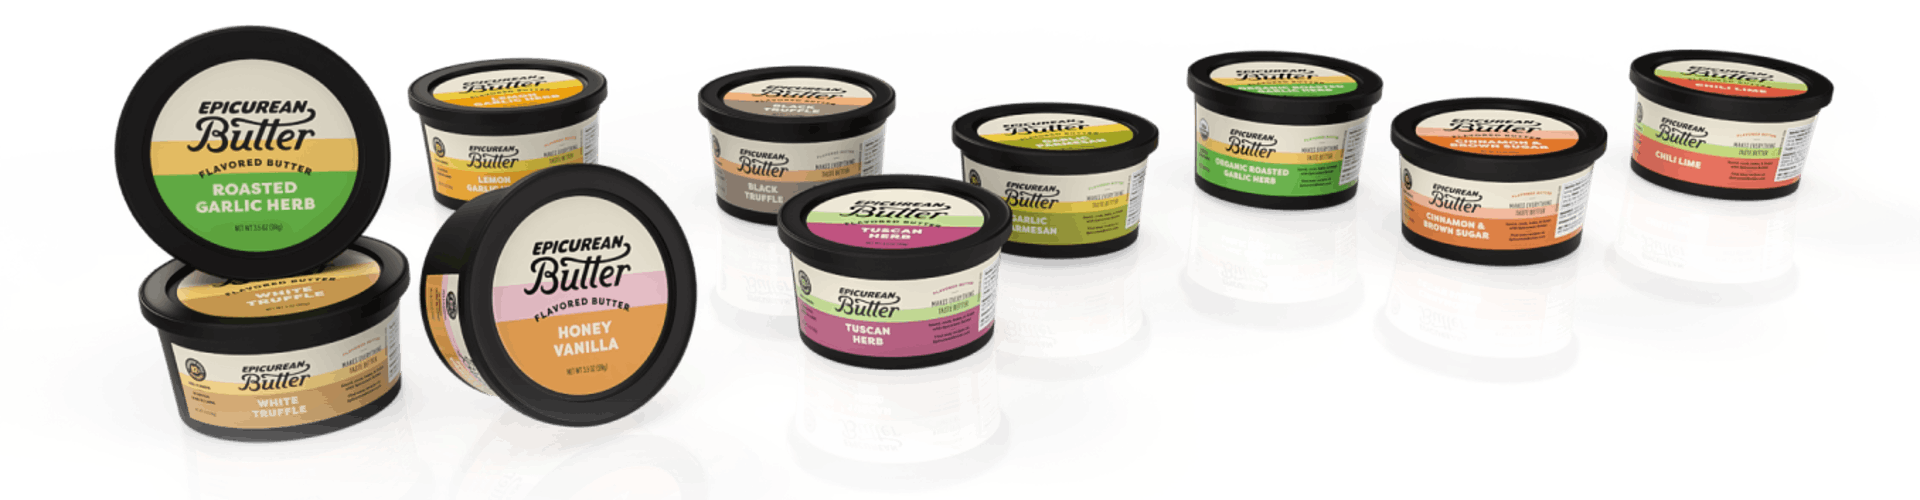 Epicurean Butter tubs